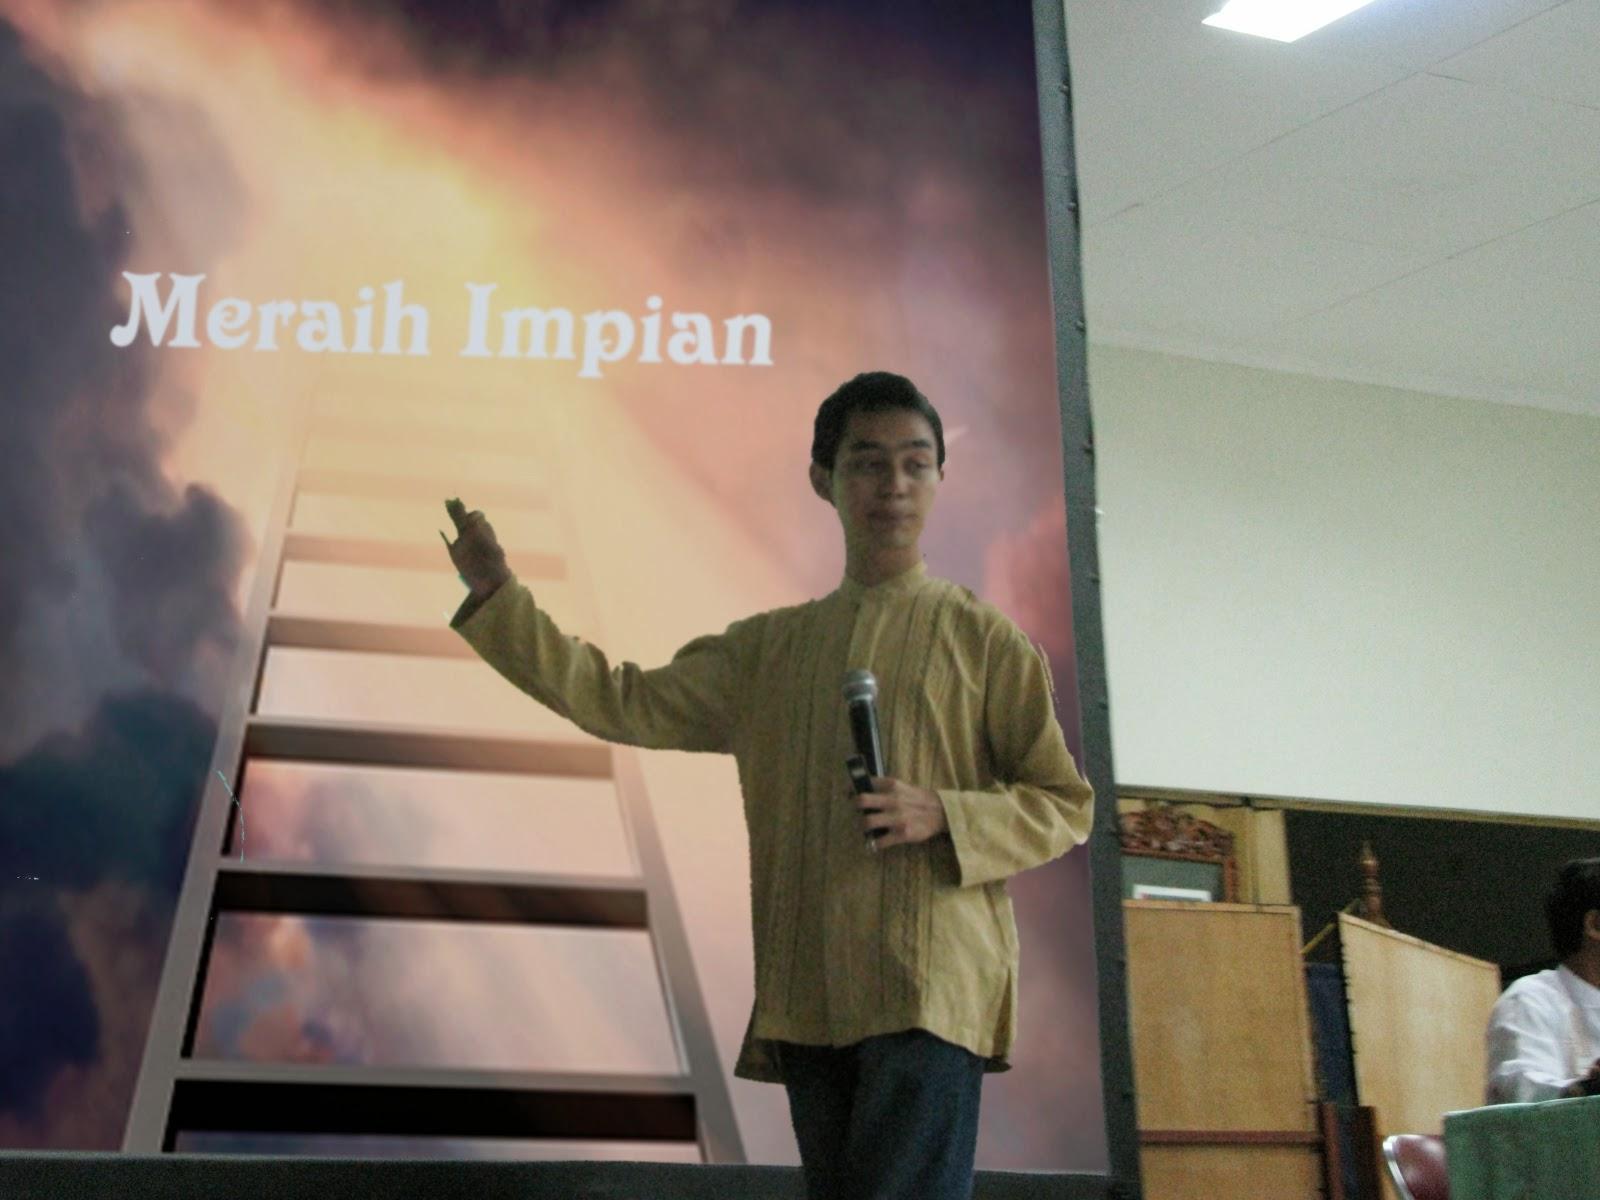 motivator termuda asia, motivator termuda, motivator termuda indonesia, motivator muda, motivator dibawah 20 tahun, motivator smp, motivator sma.,